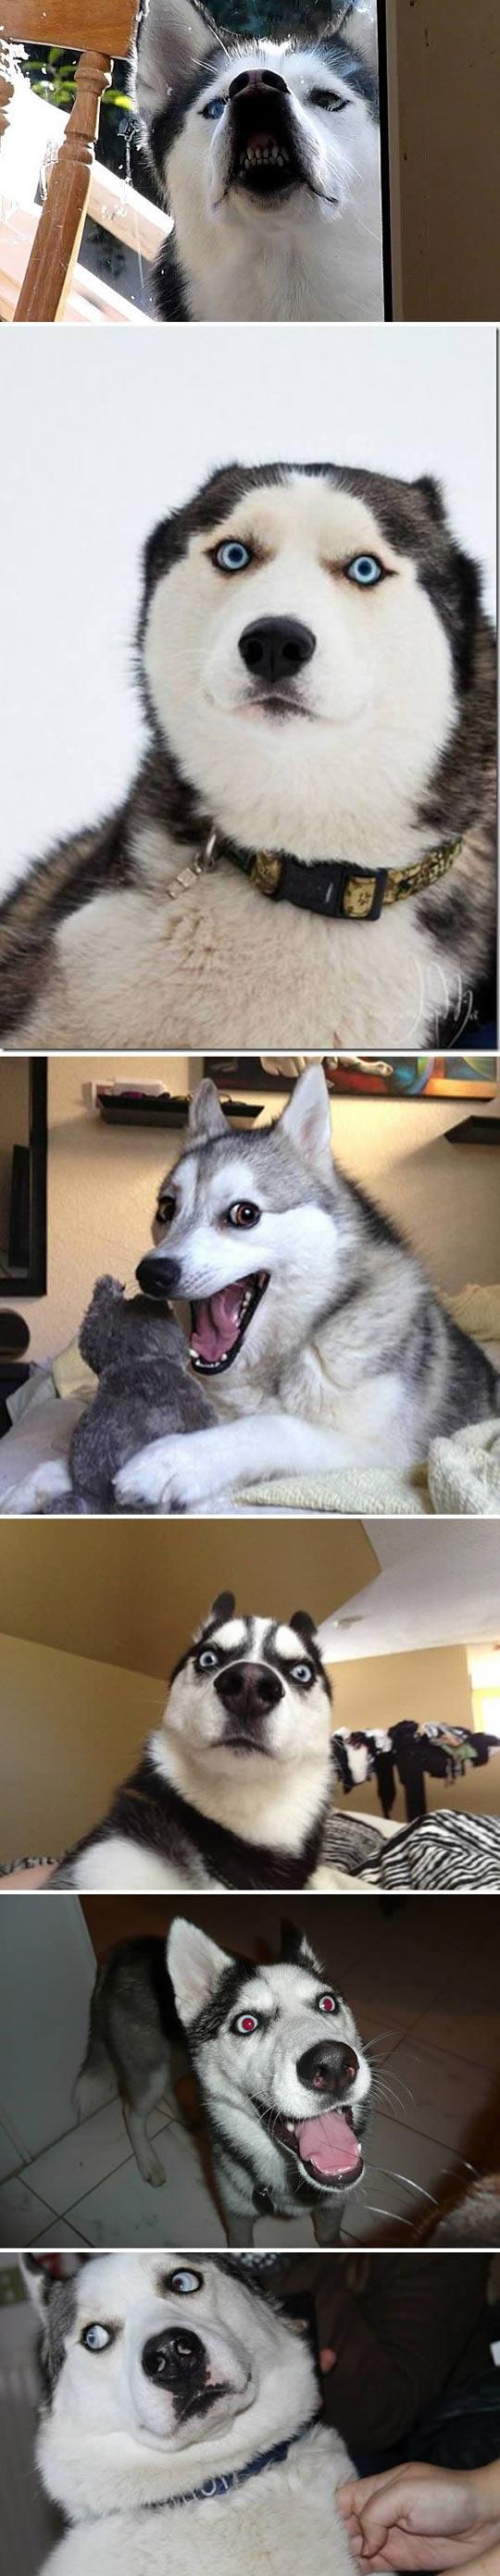 2-funny-husky-dog-siberian-faces-smile